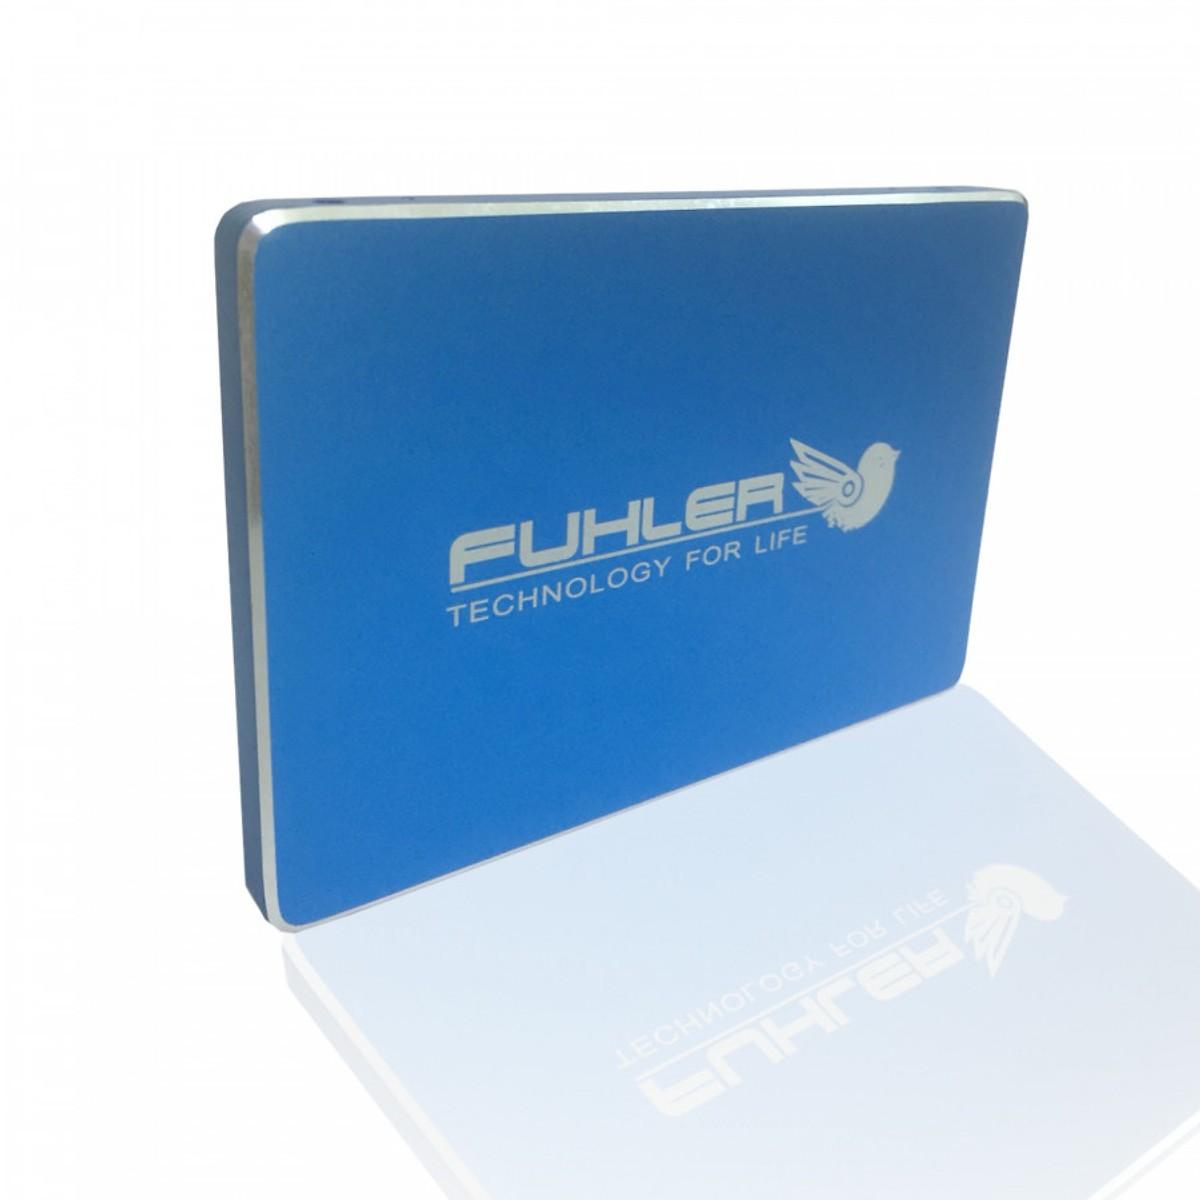 Ổ cứng SSD Fuhler 256GB